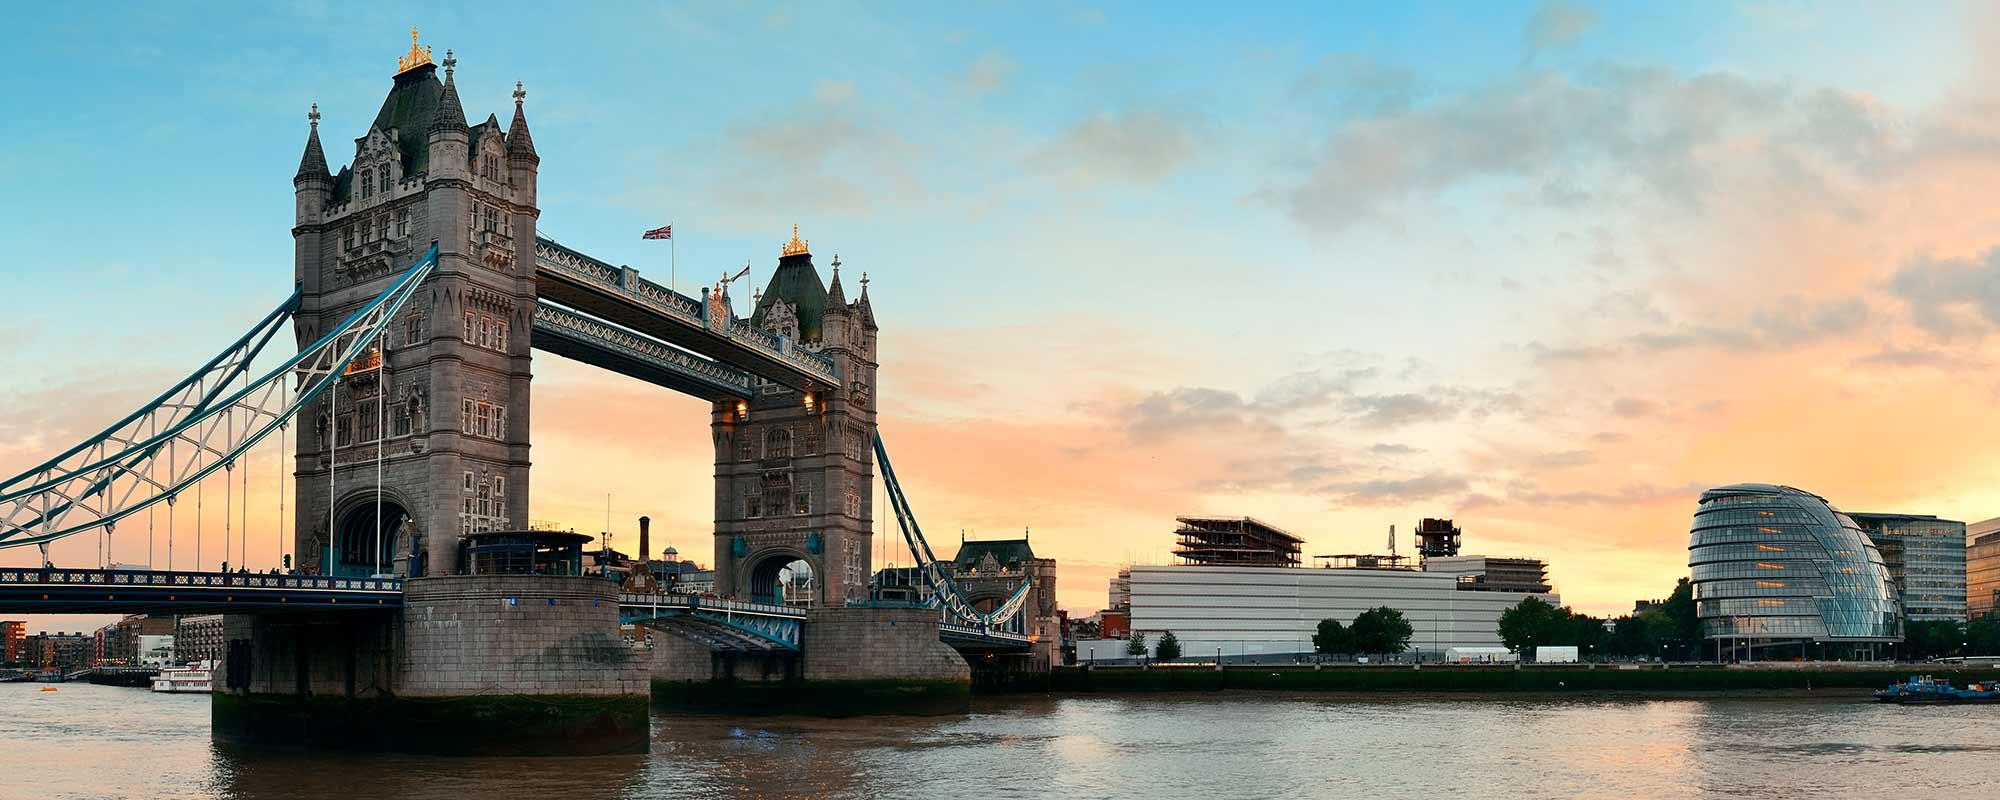 City Of London Building Control Address